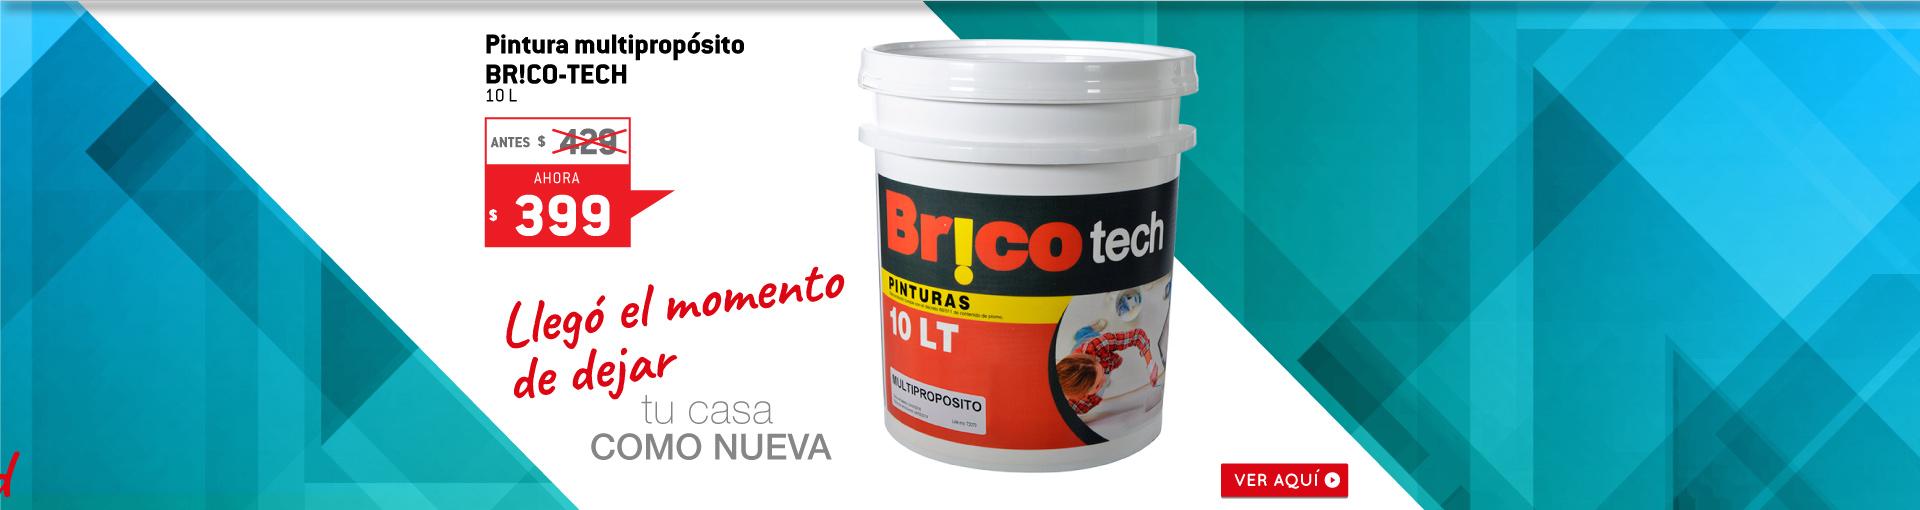 h-06-690447-pintura-bricotech